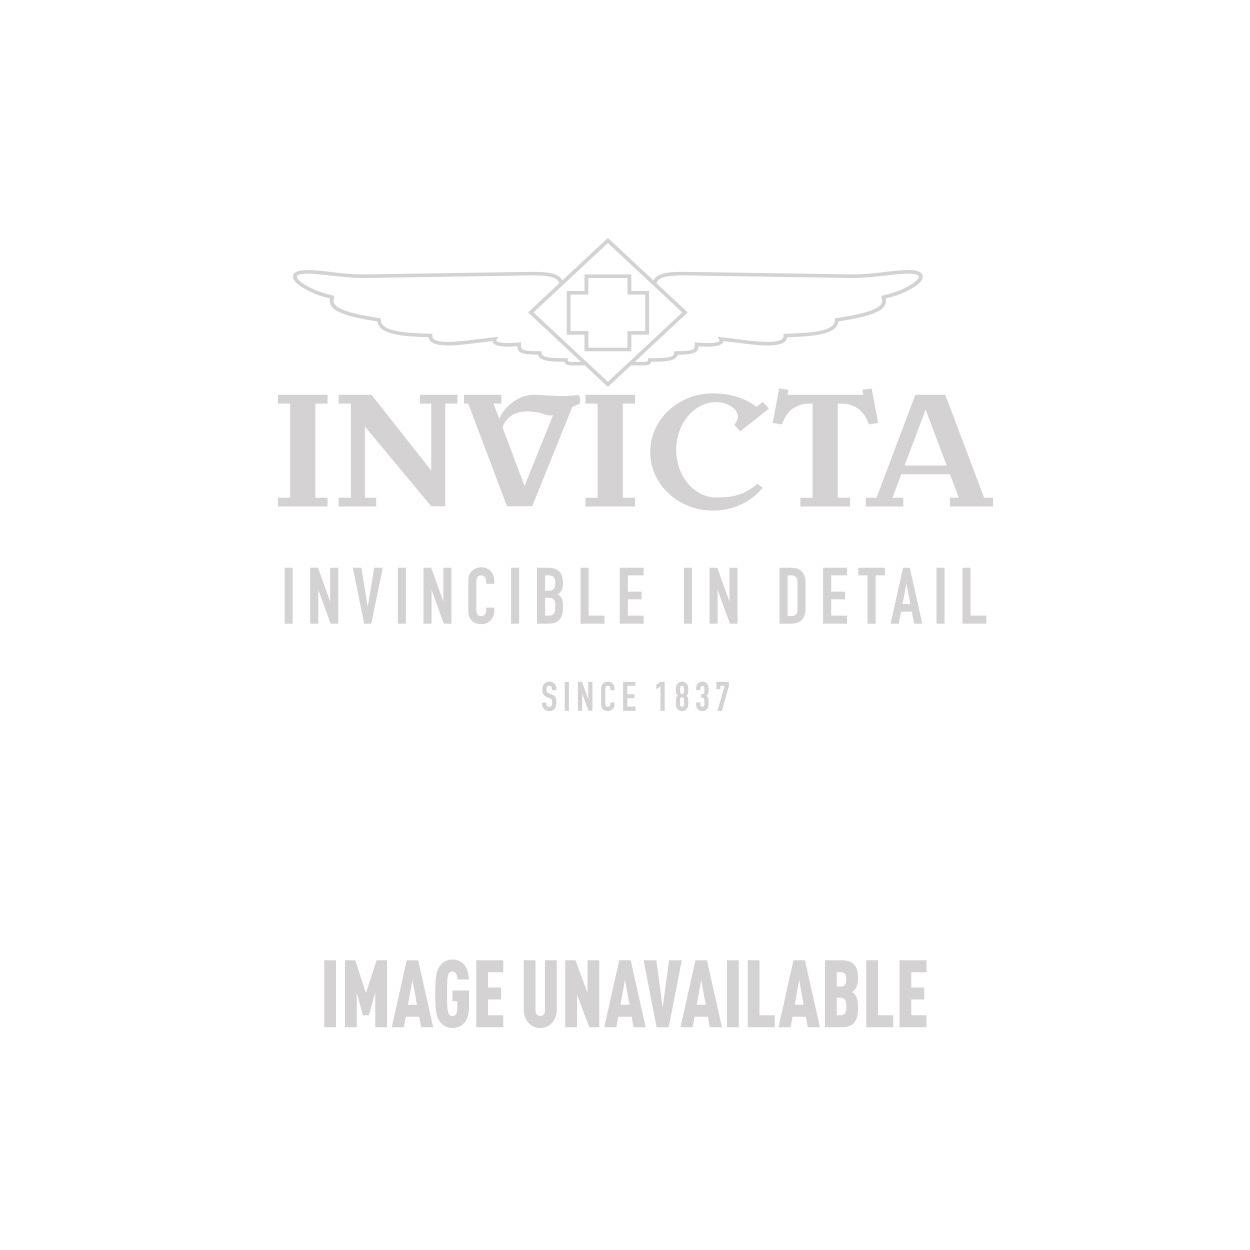 Invicta Pro Diver Men's Automatic 47mm Stainless Steel Case Platinum Dial -  Model 22024